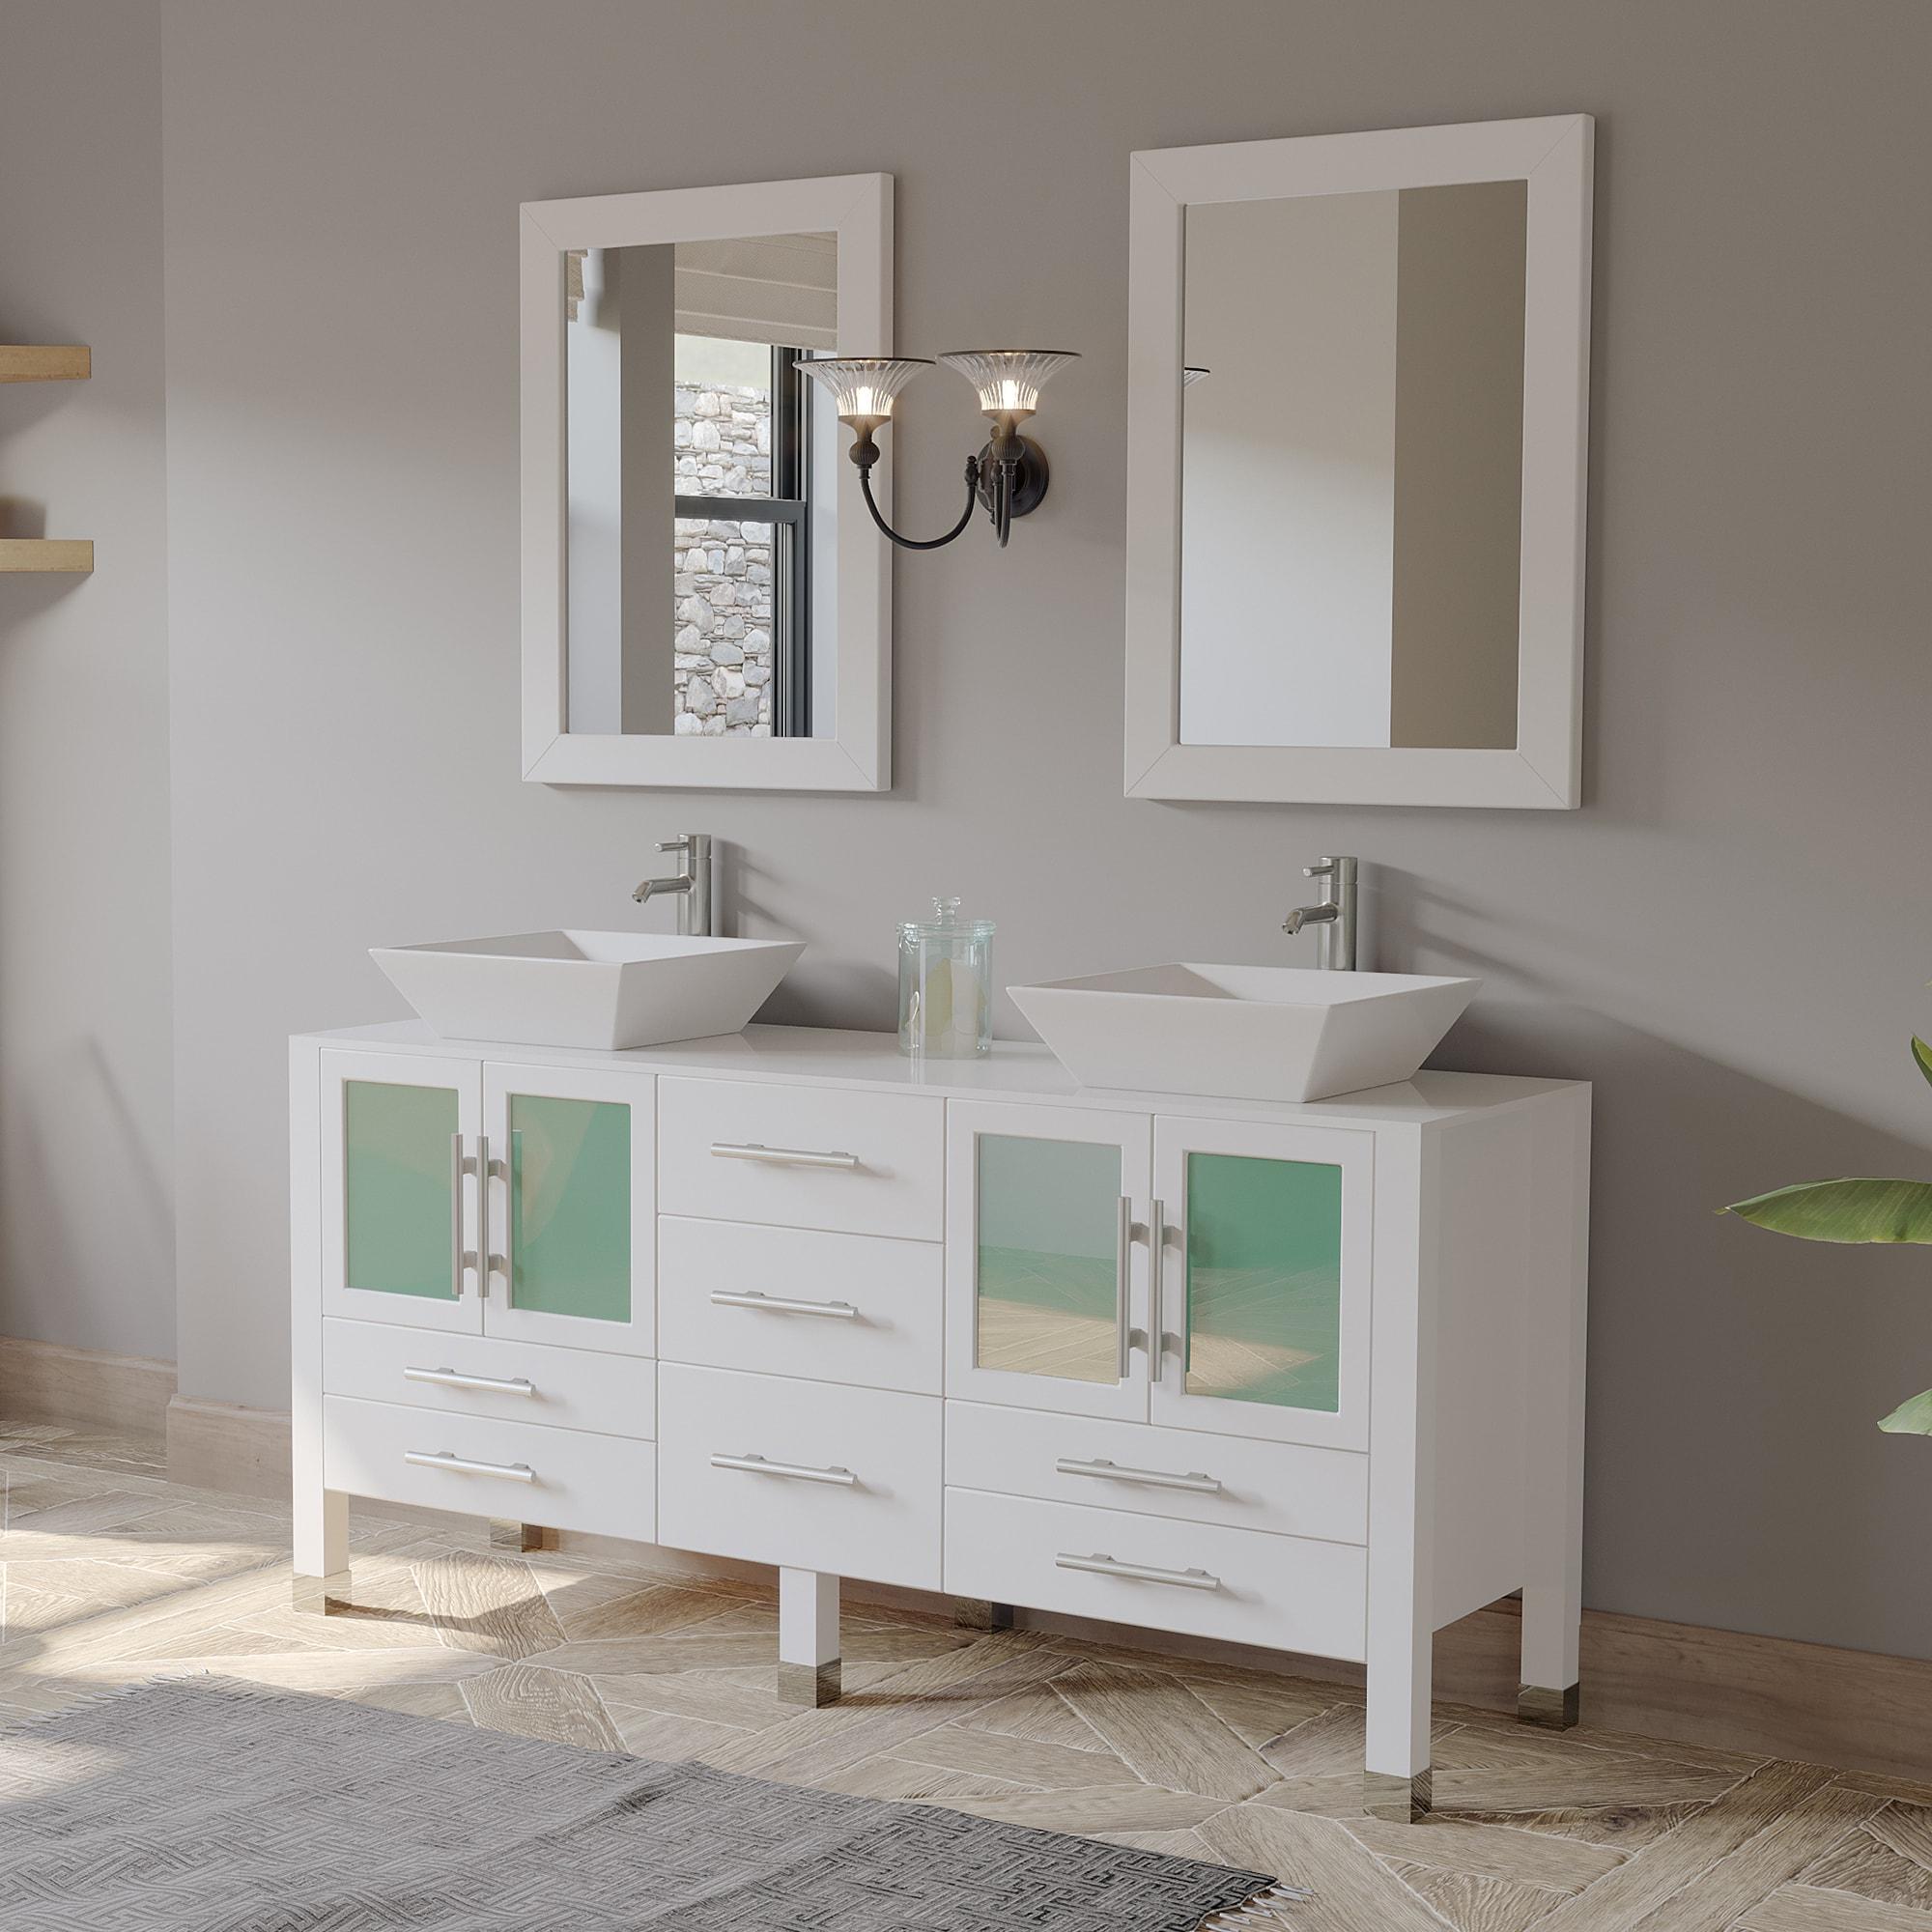 White Oak Wood and Trim Porcelain Vessel Sink Double